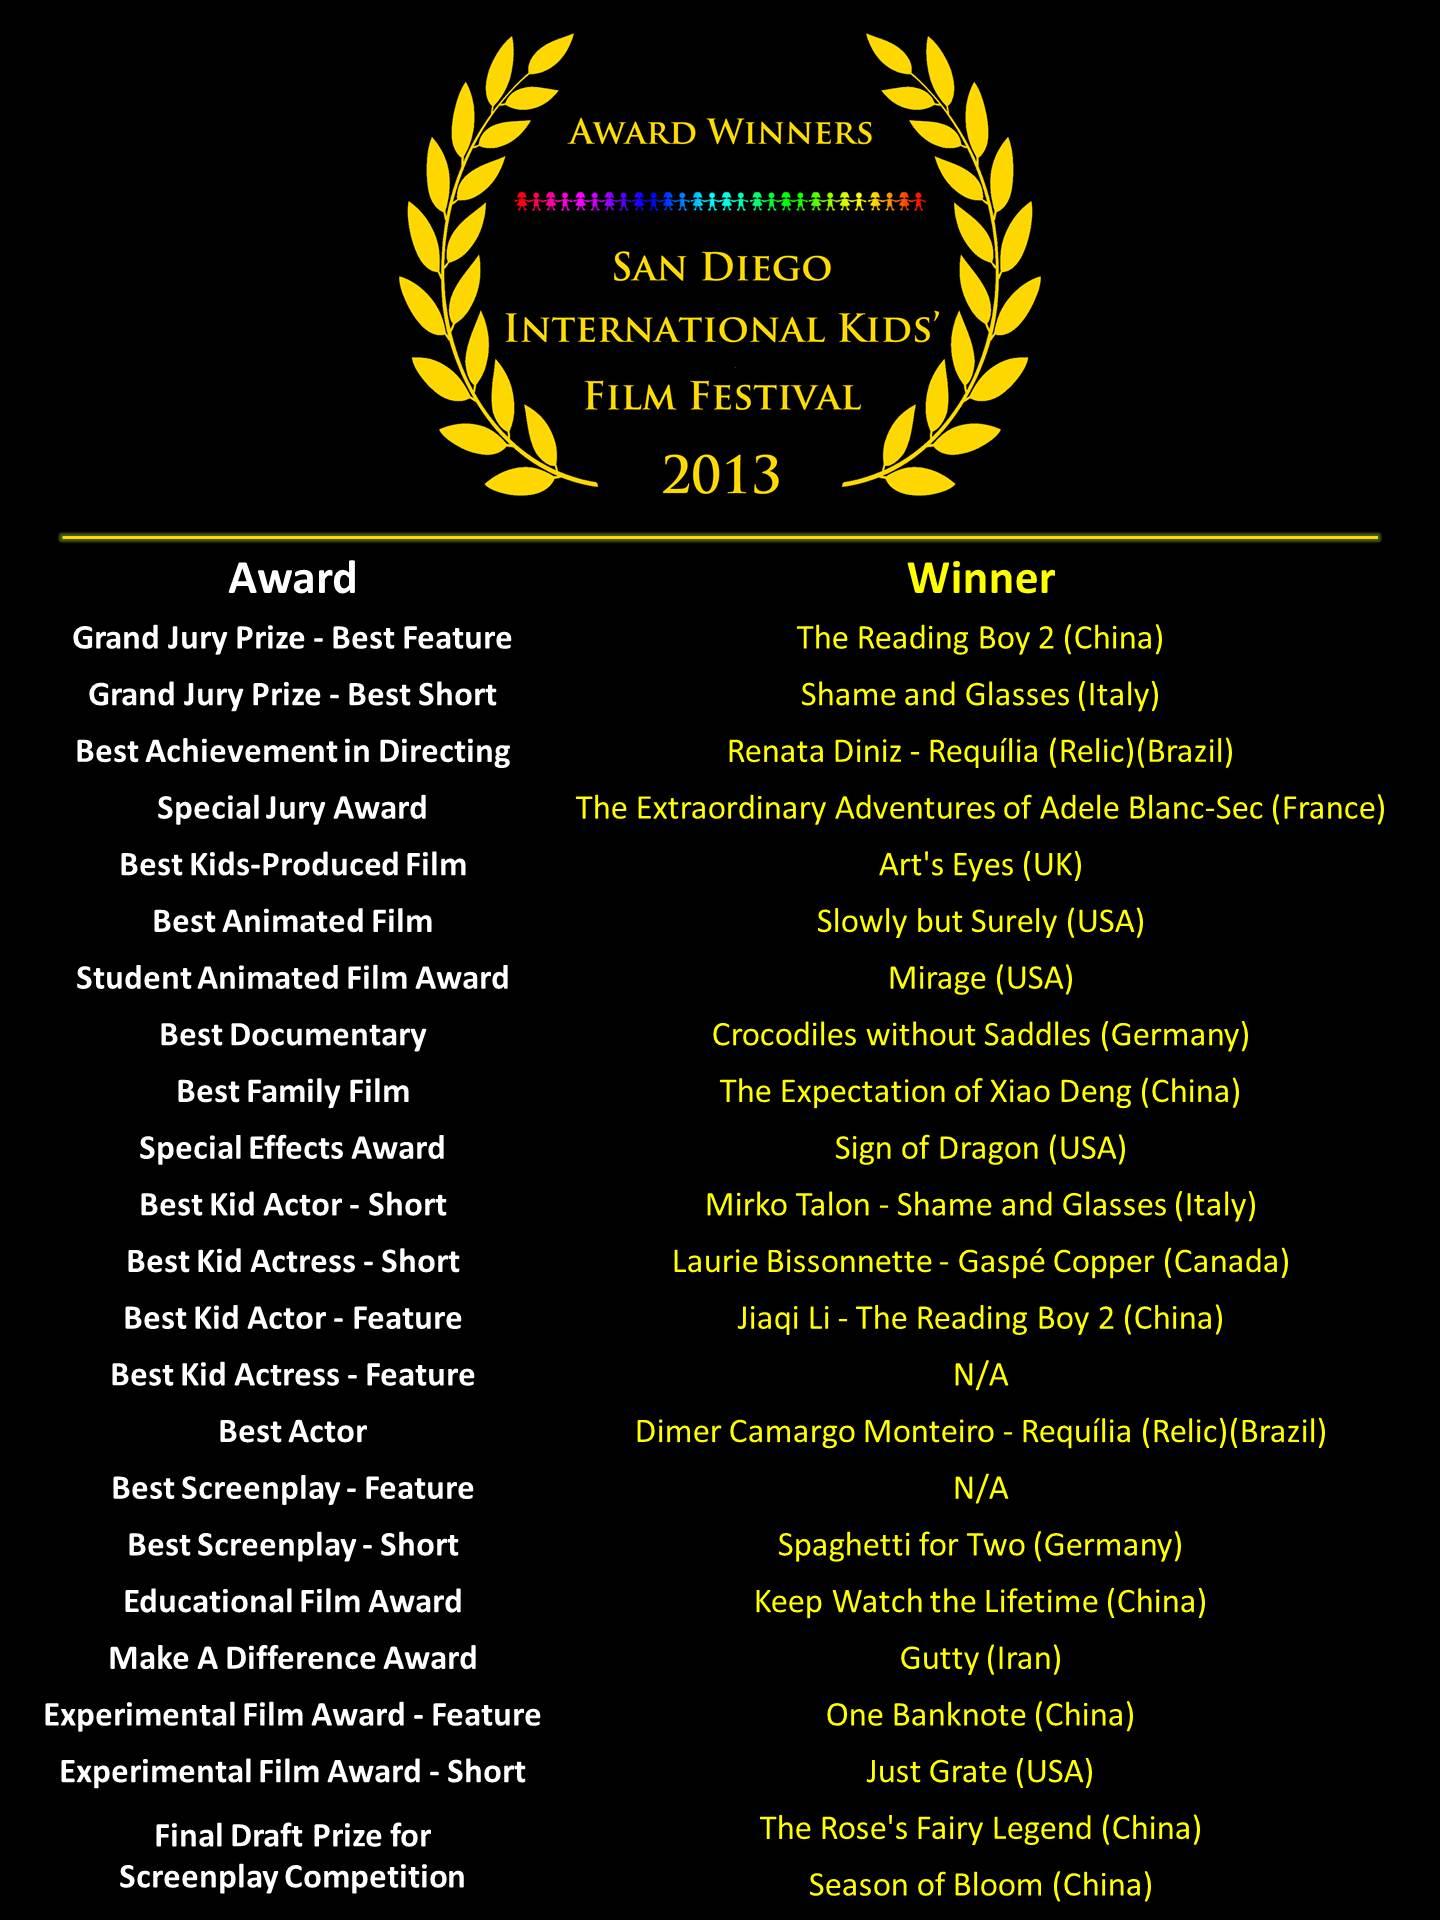 The 2013 San Diego Kids Film Festival Winner list